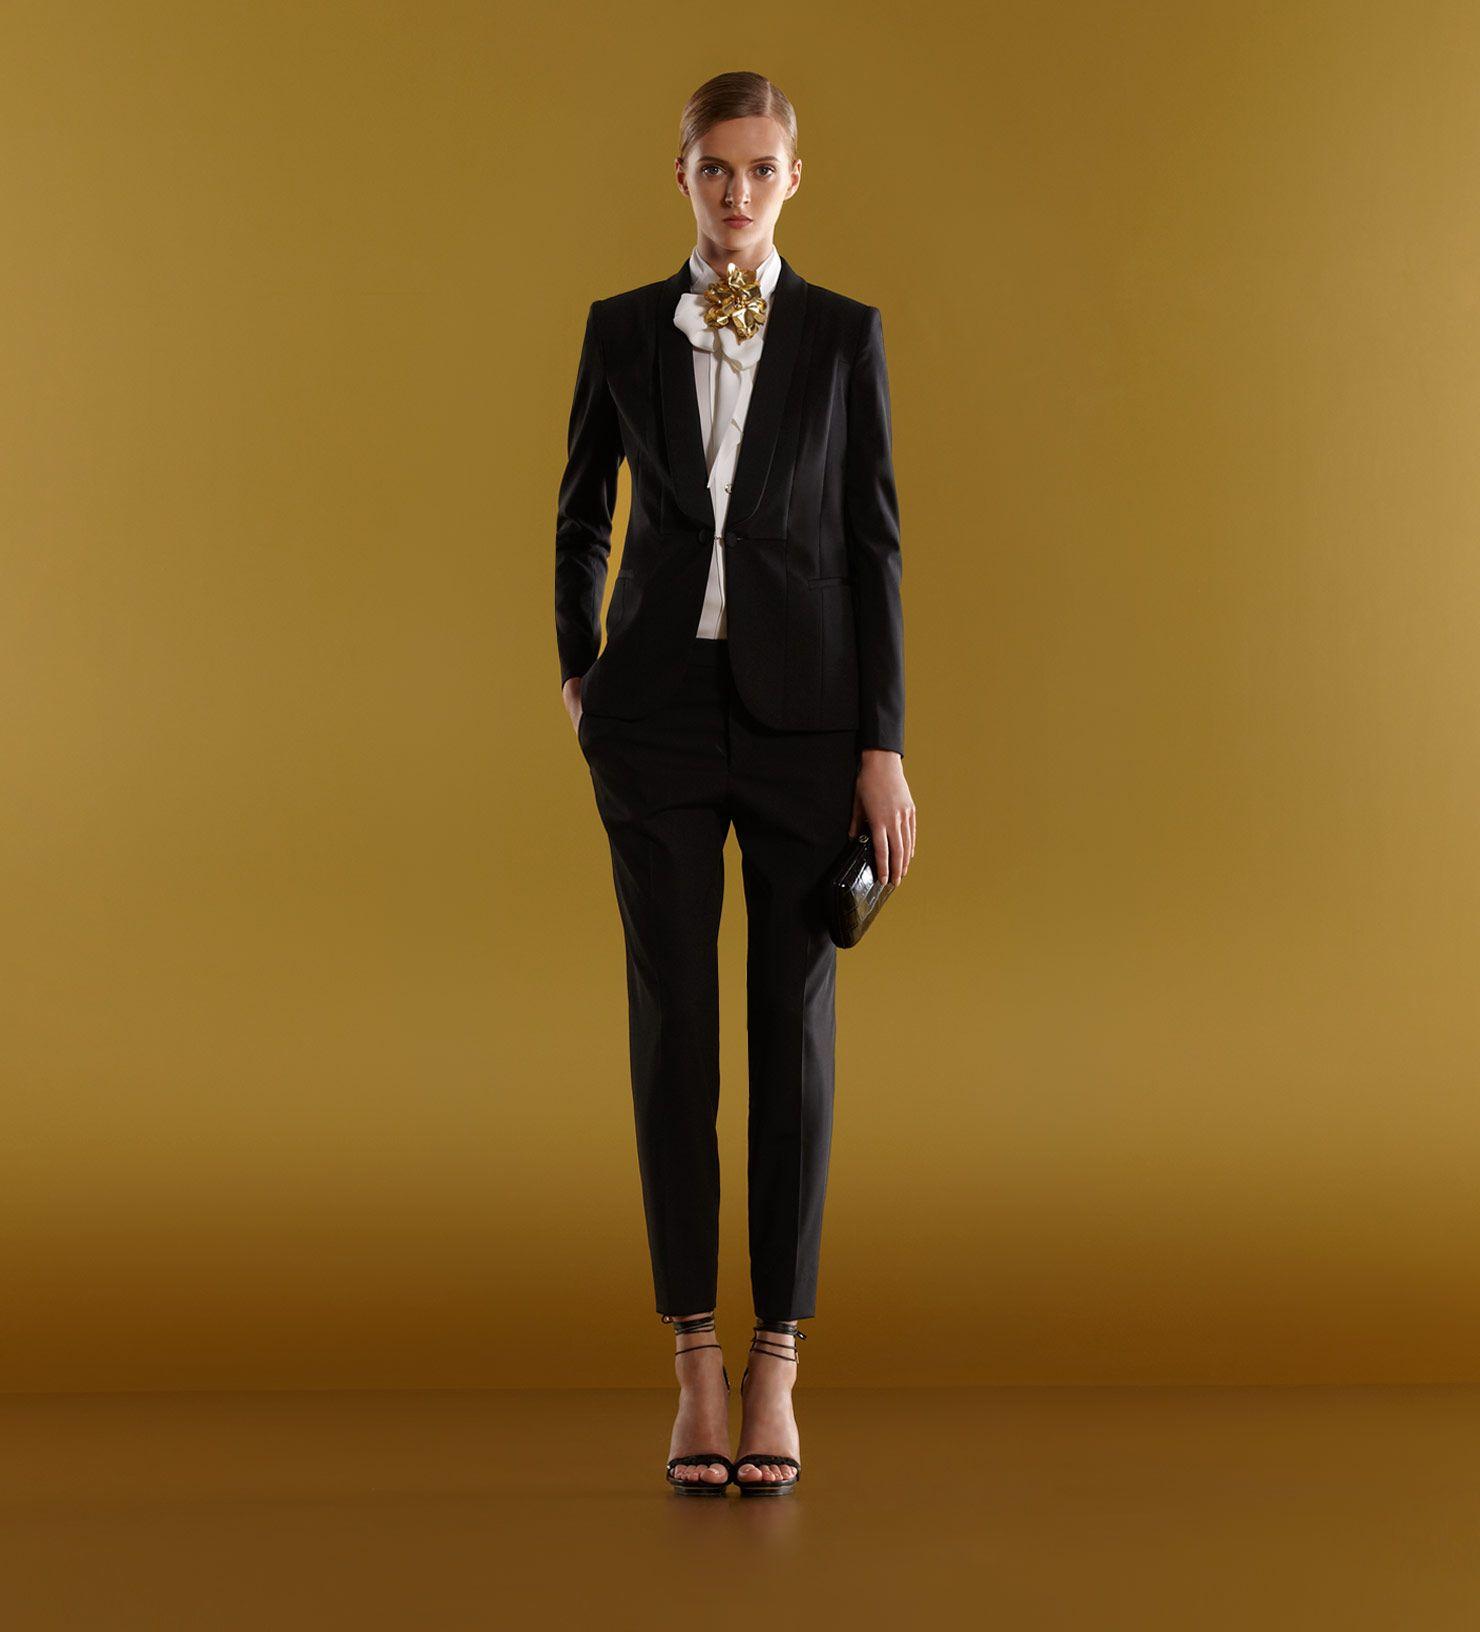 Gucci Tuxedo Jacket Holiday Pant Tie Collar Shirt 1 My Style Zaskia Mecca Elena Blouse Navy